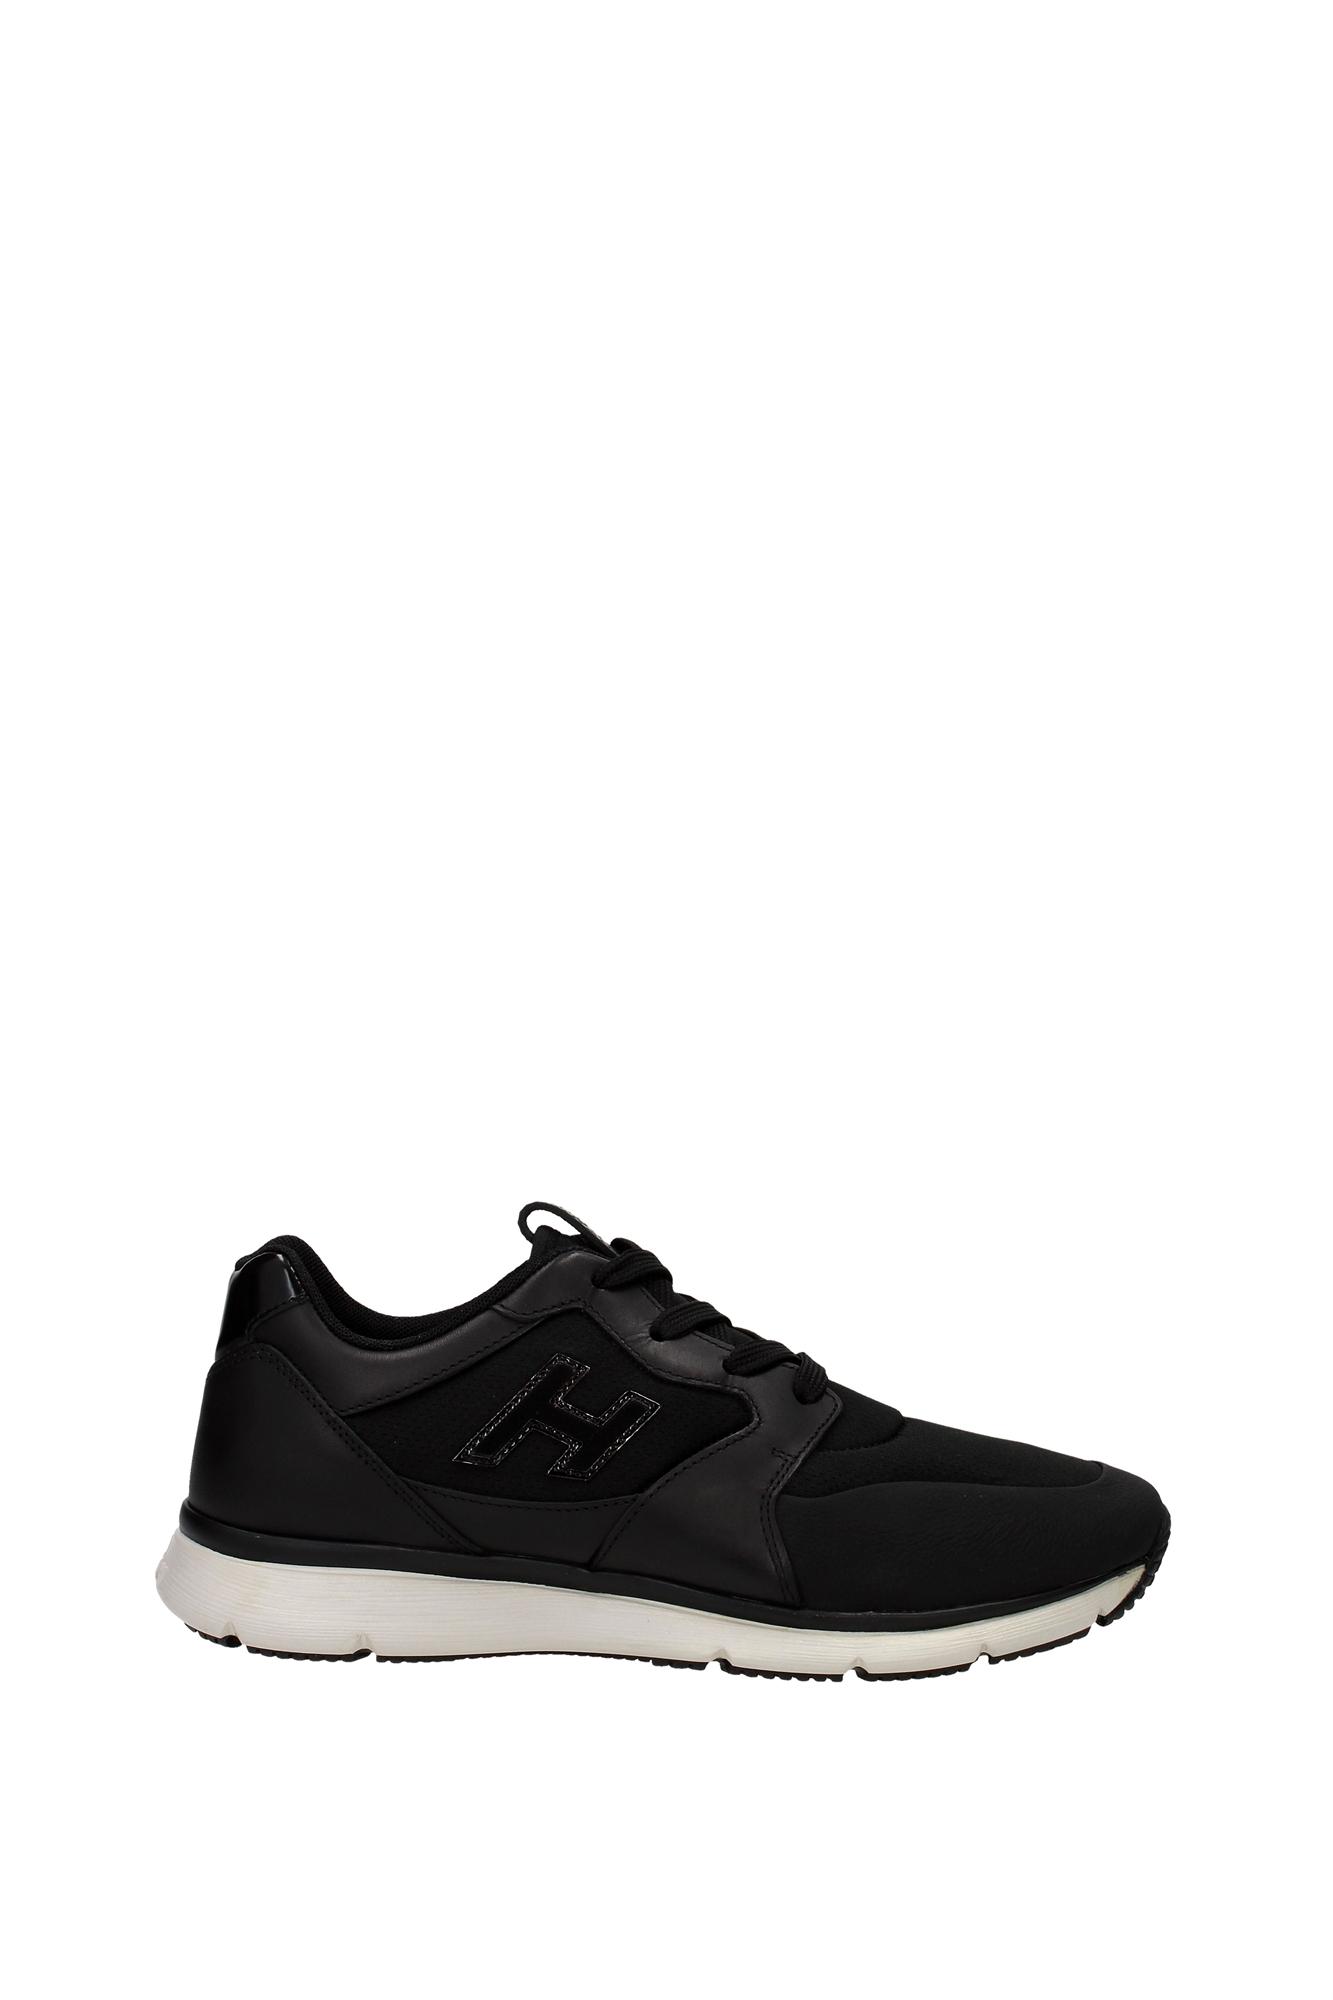 sneakers hogan herren stoff schwarz hxm2540u140cqkb999 ebay. Black Bedroom Furniture Sets. Home Design Ideas